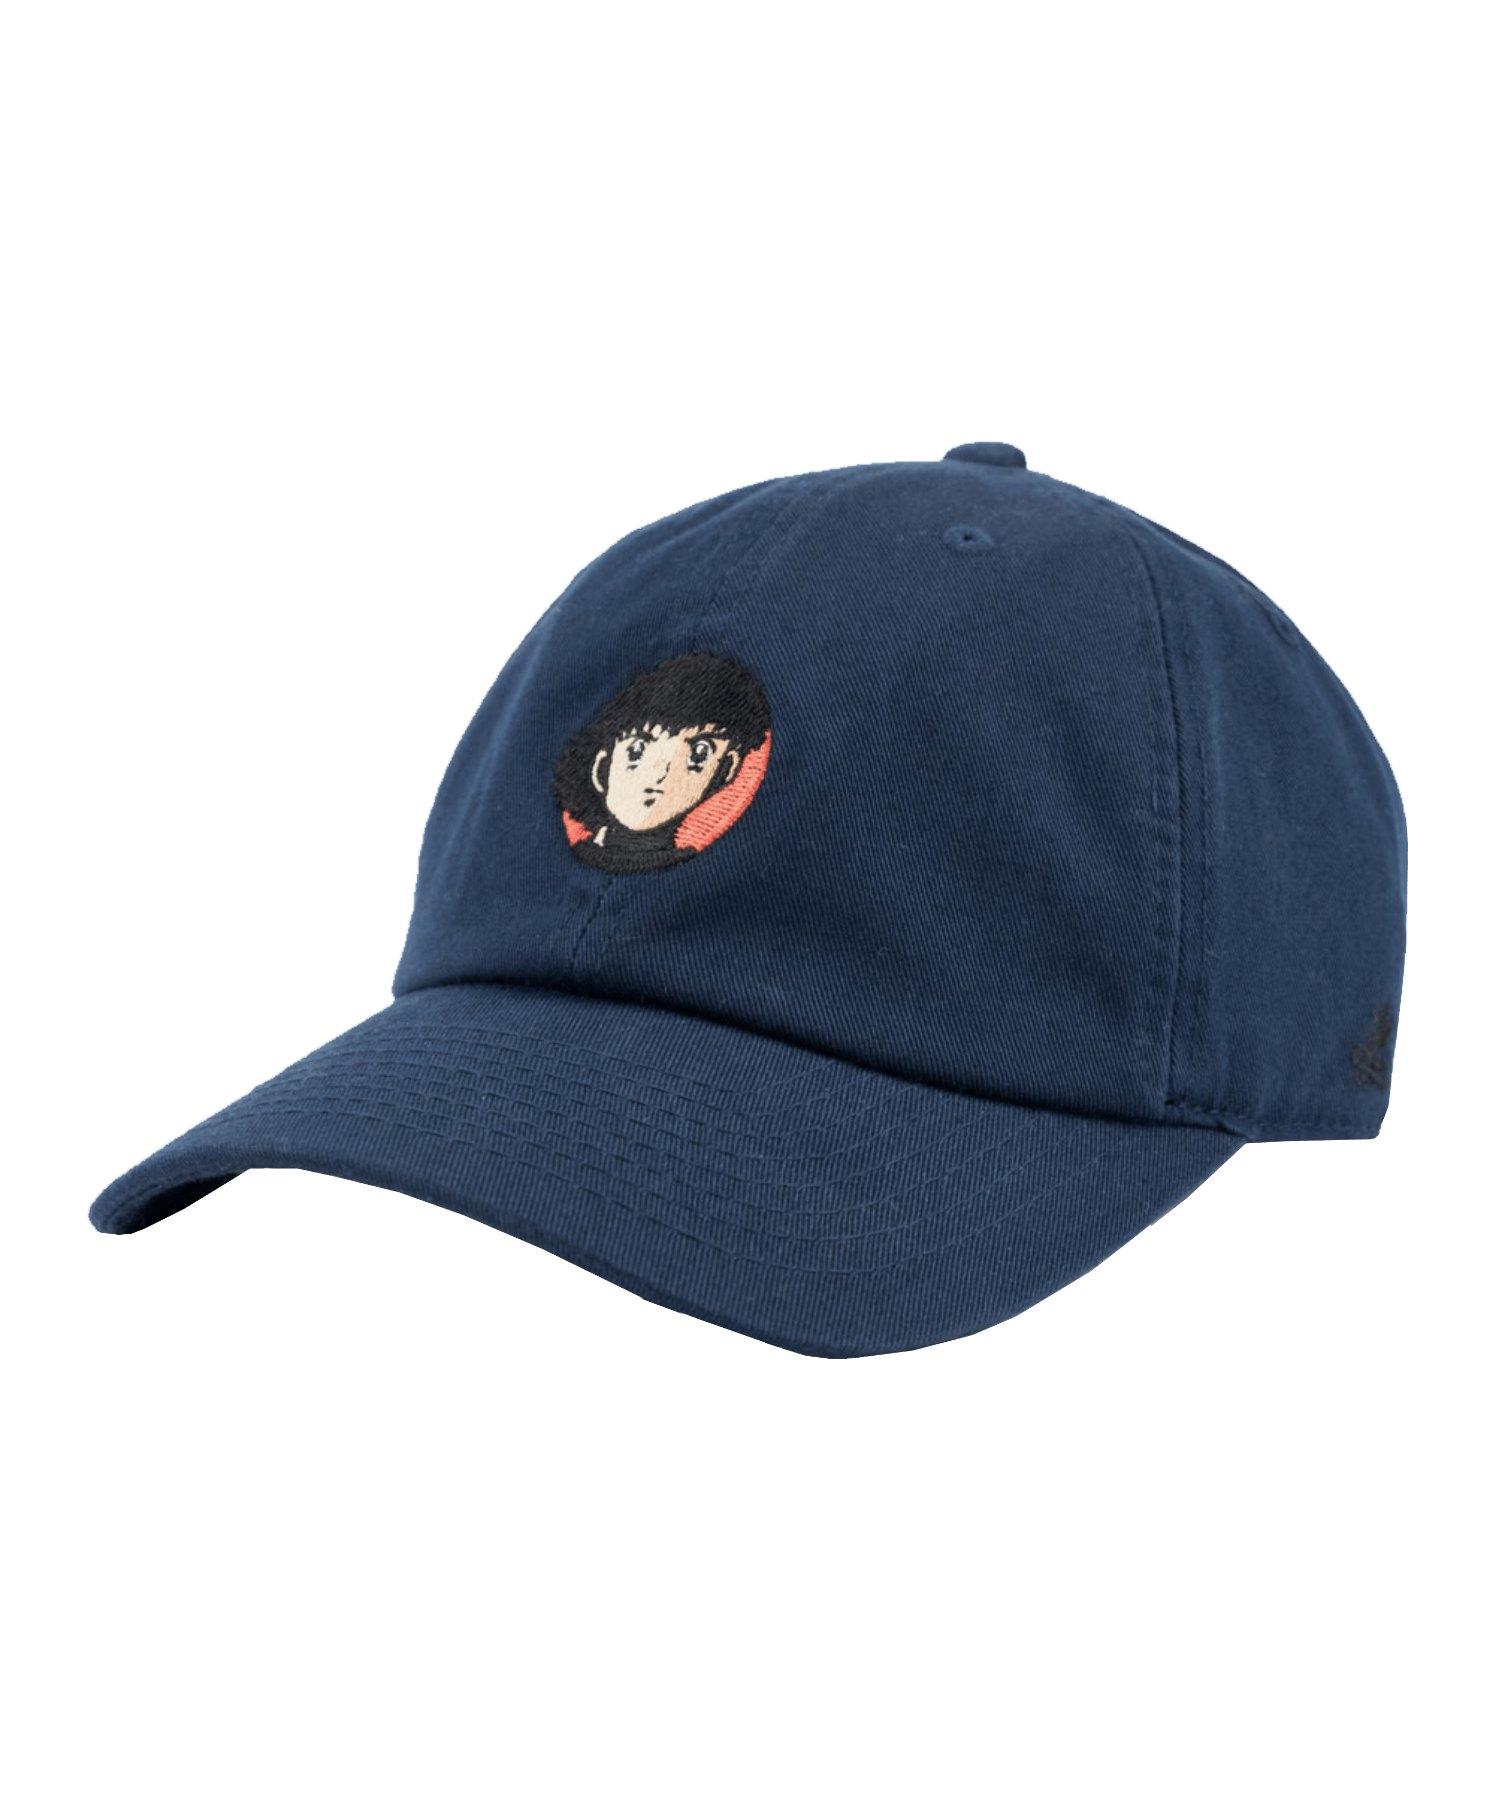 L&L Captain Tsubasa Icon 09 Polo Cap Blau - blau